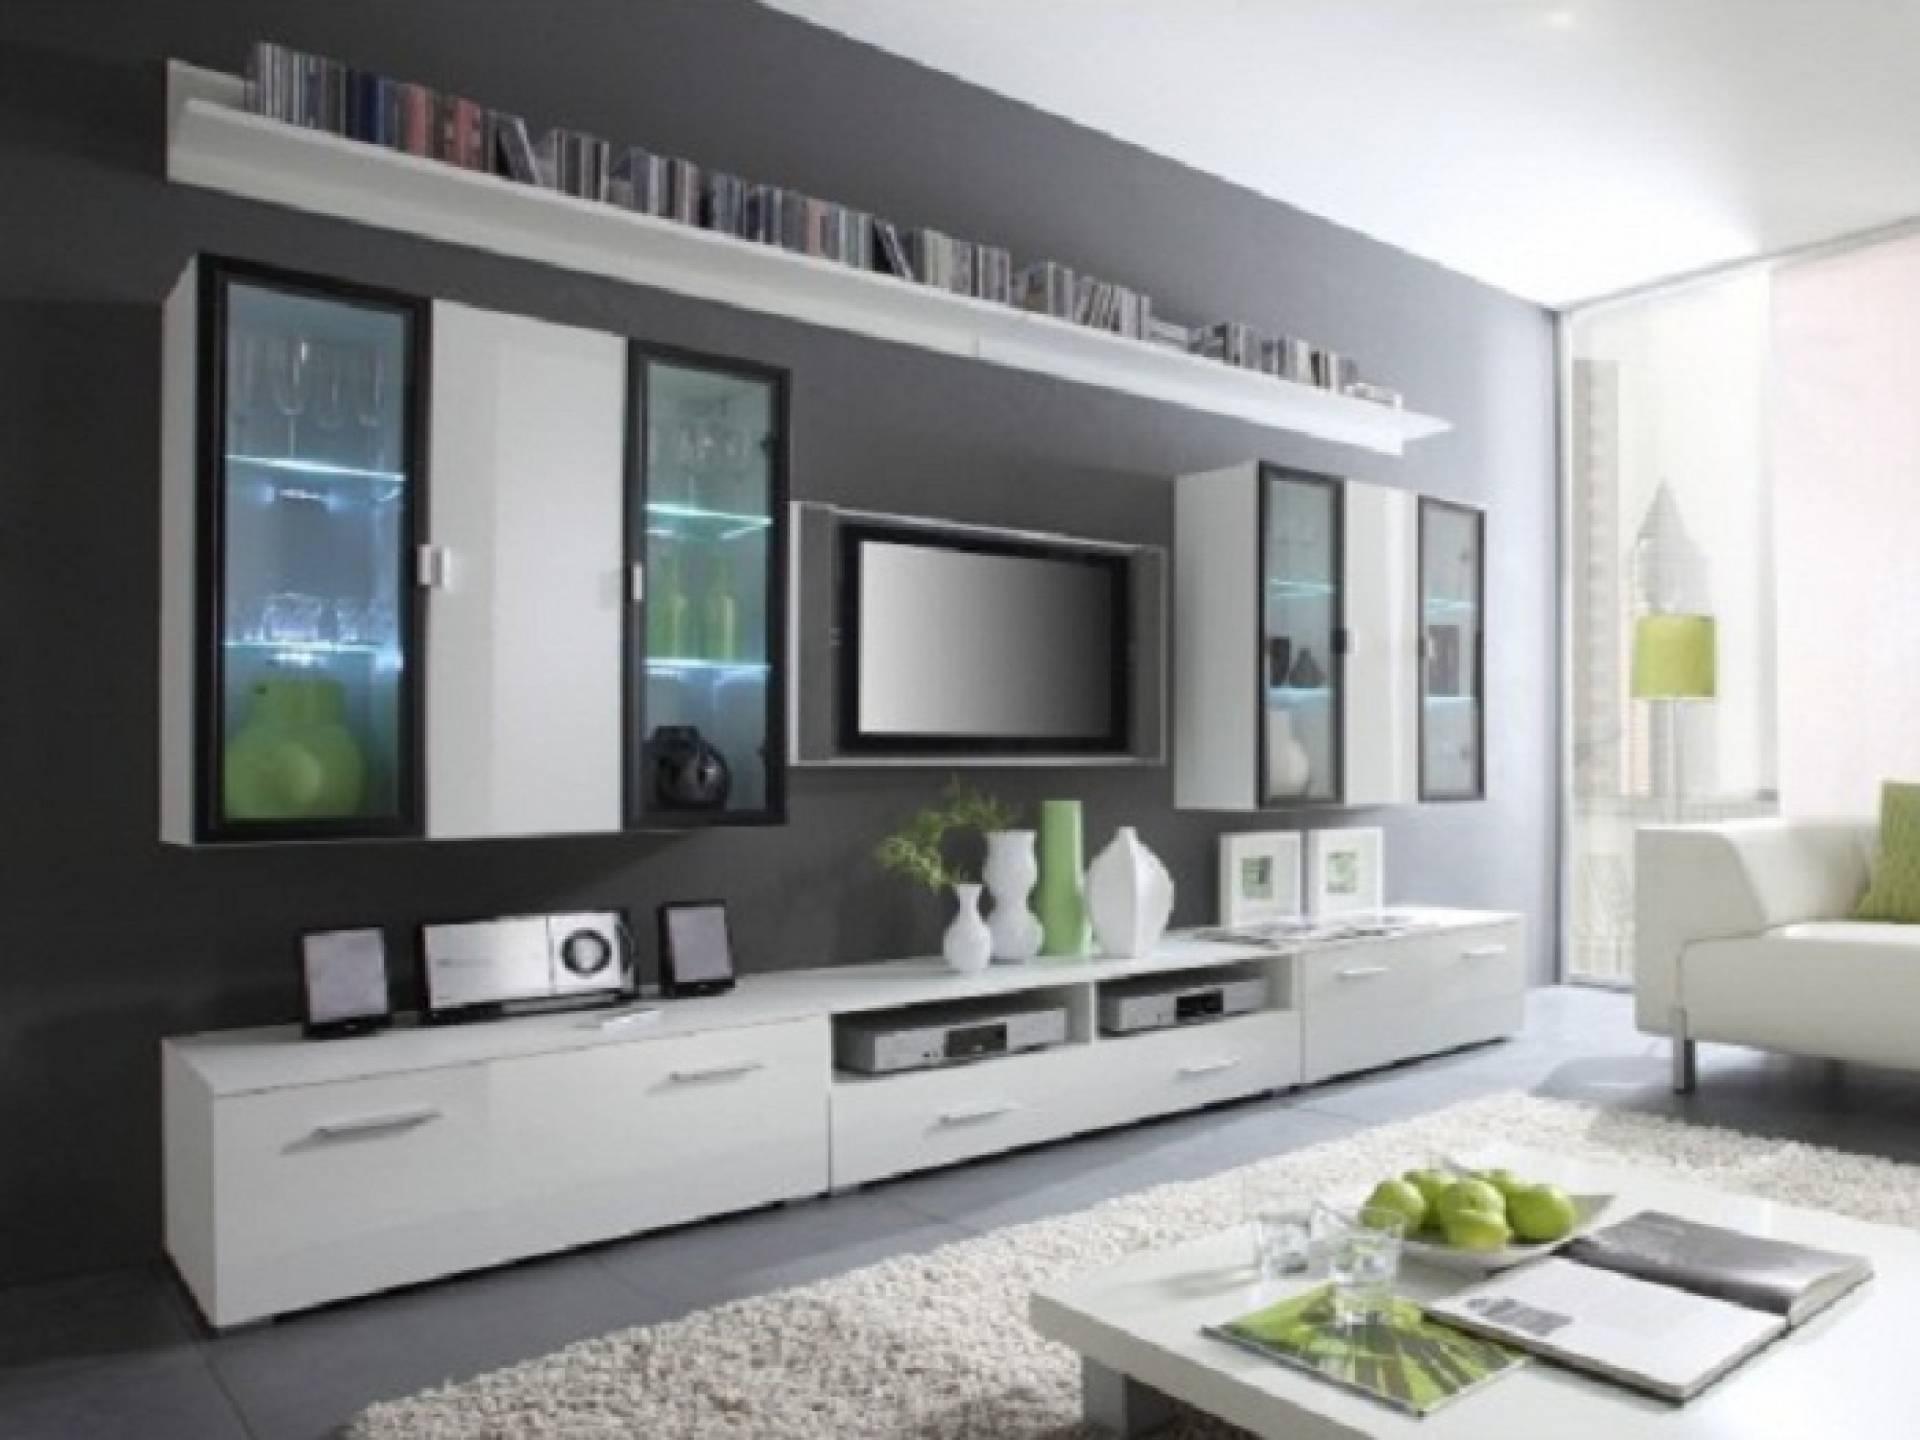 Wall Units. Amusing Tv Console Wall Units: Breathtaking-Tv-Console in Tv Cabinets And Wall Units (Image 13 of 15)